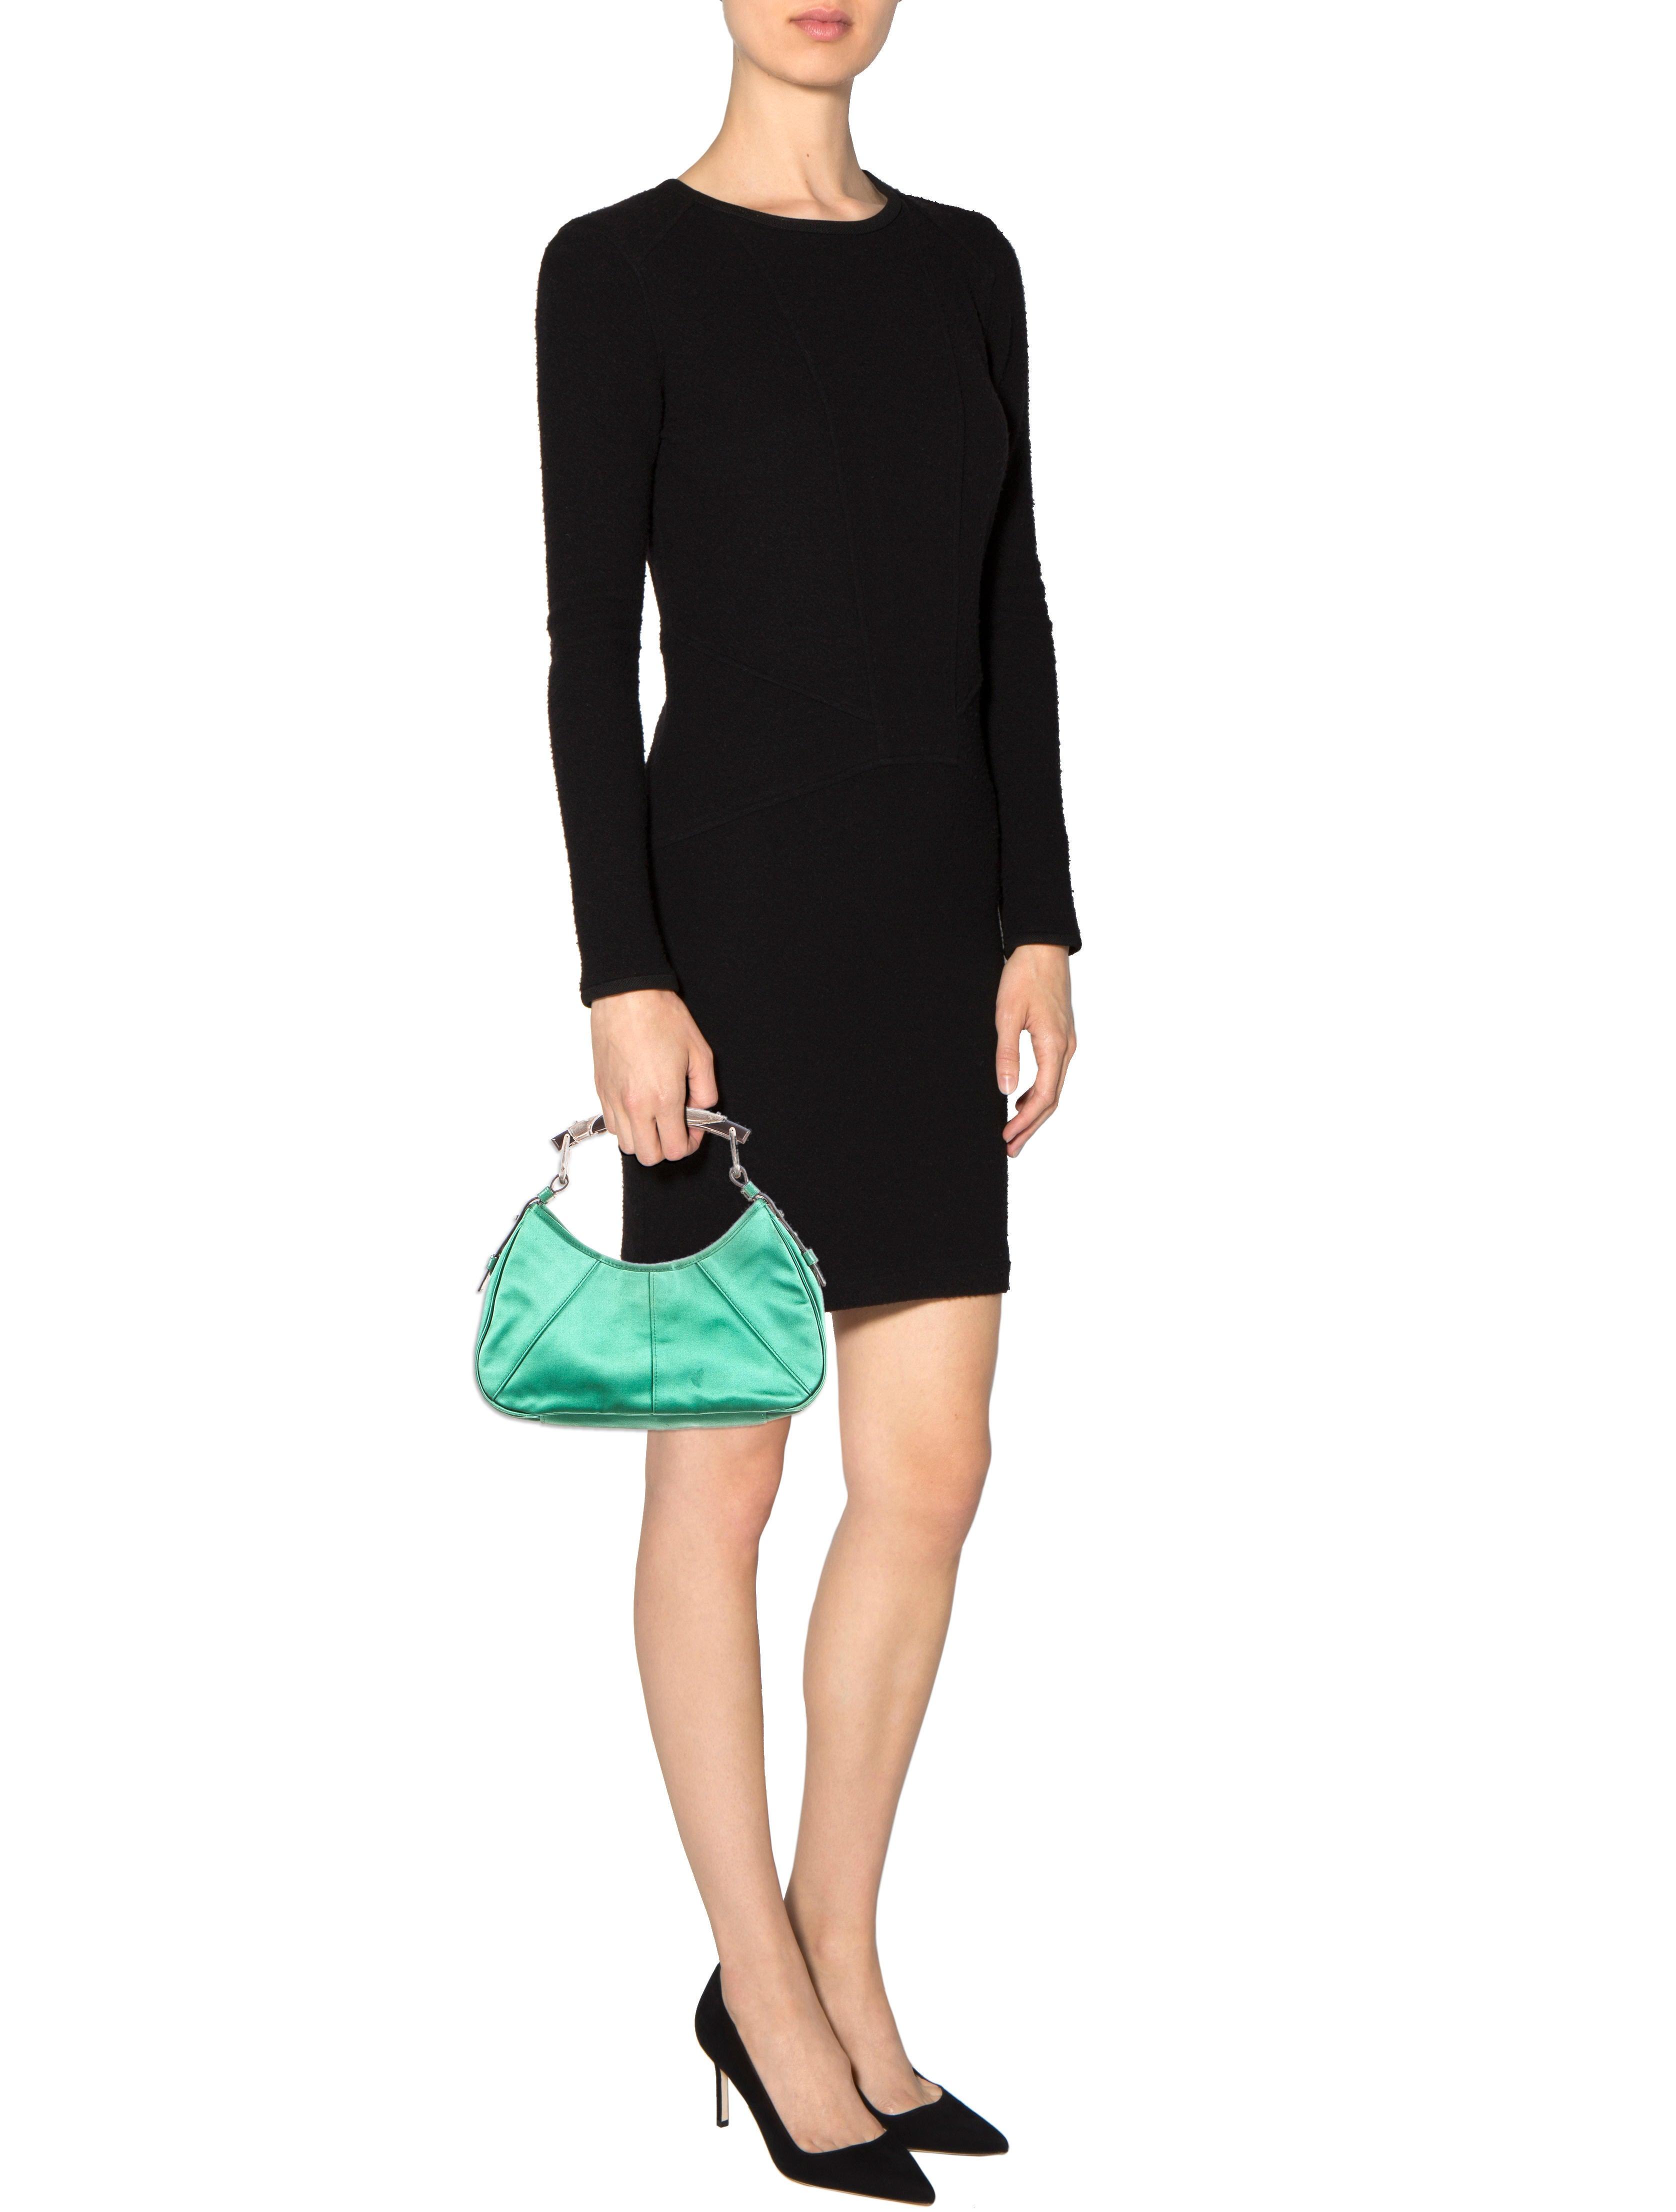 Yves Saint Laurent Mini Mombasa - Handbags - YVE37072 | The RealReal